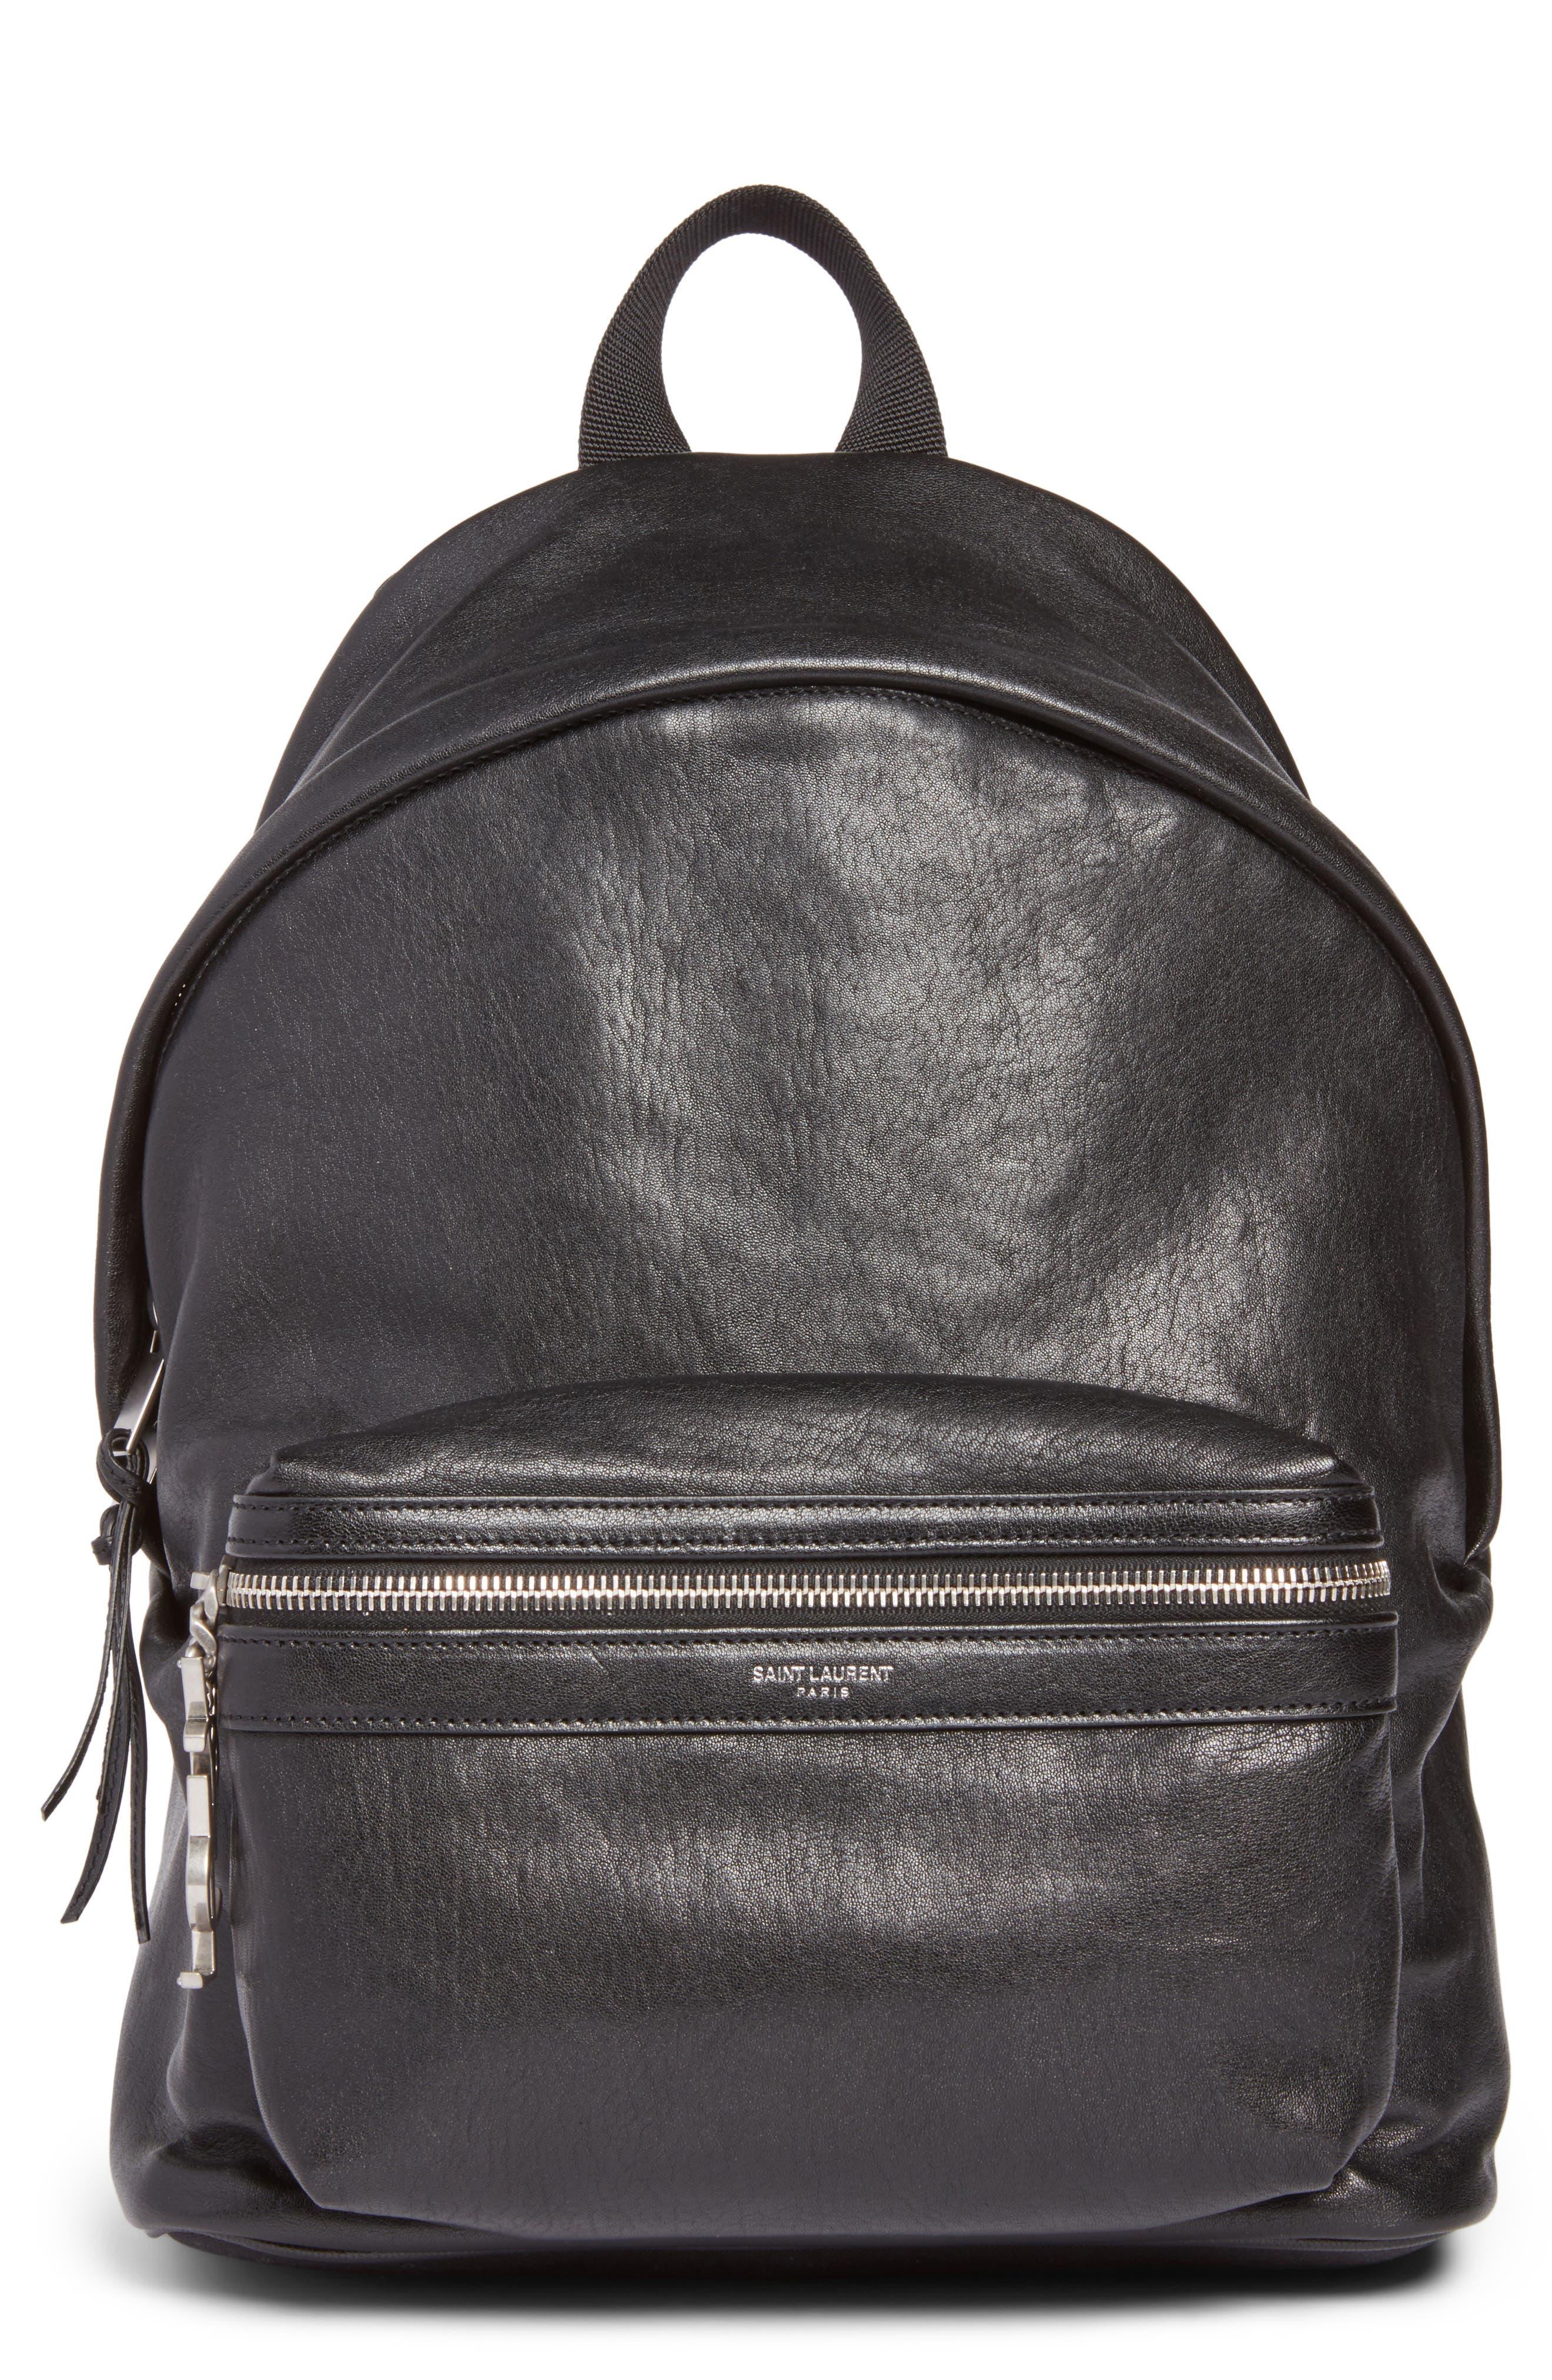 Saint Laurent Mini City Leather Backpack